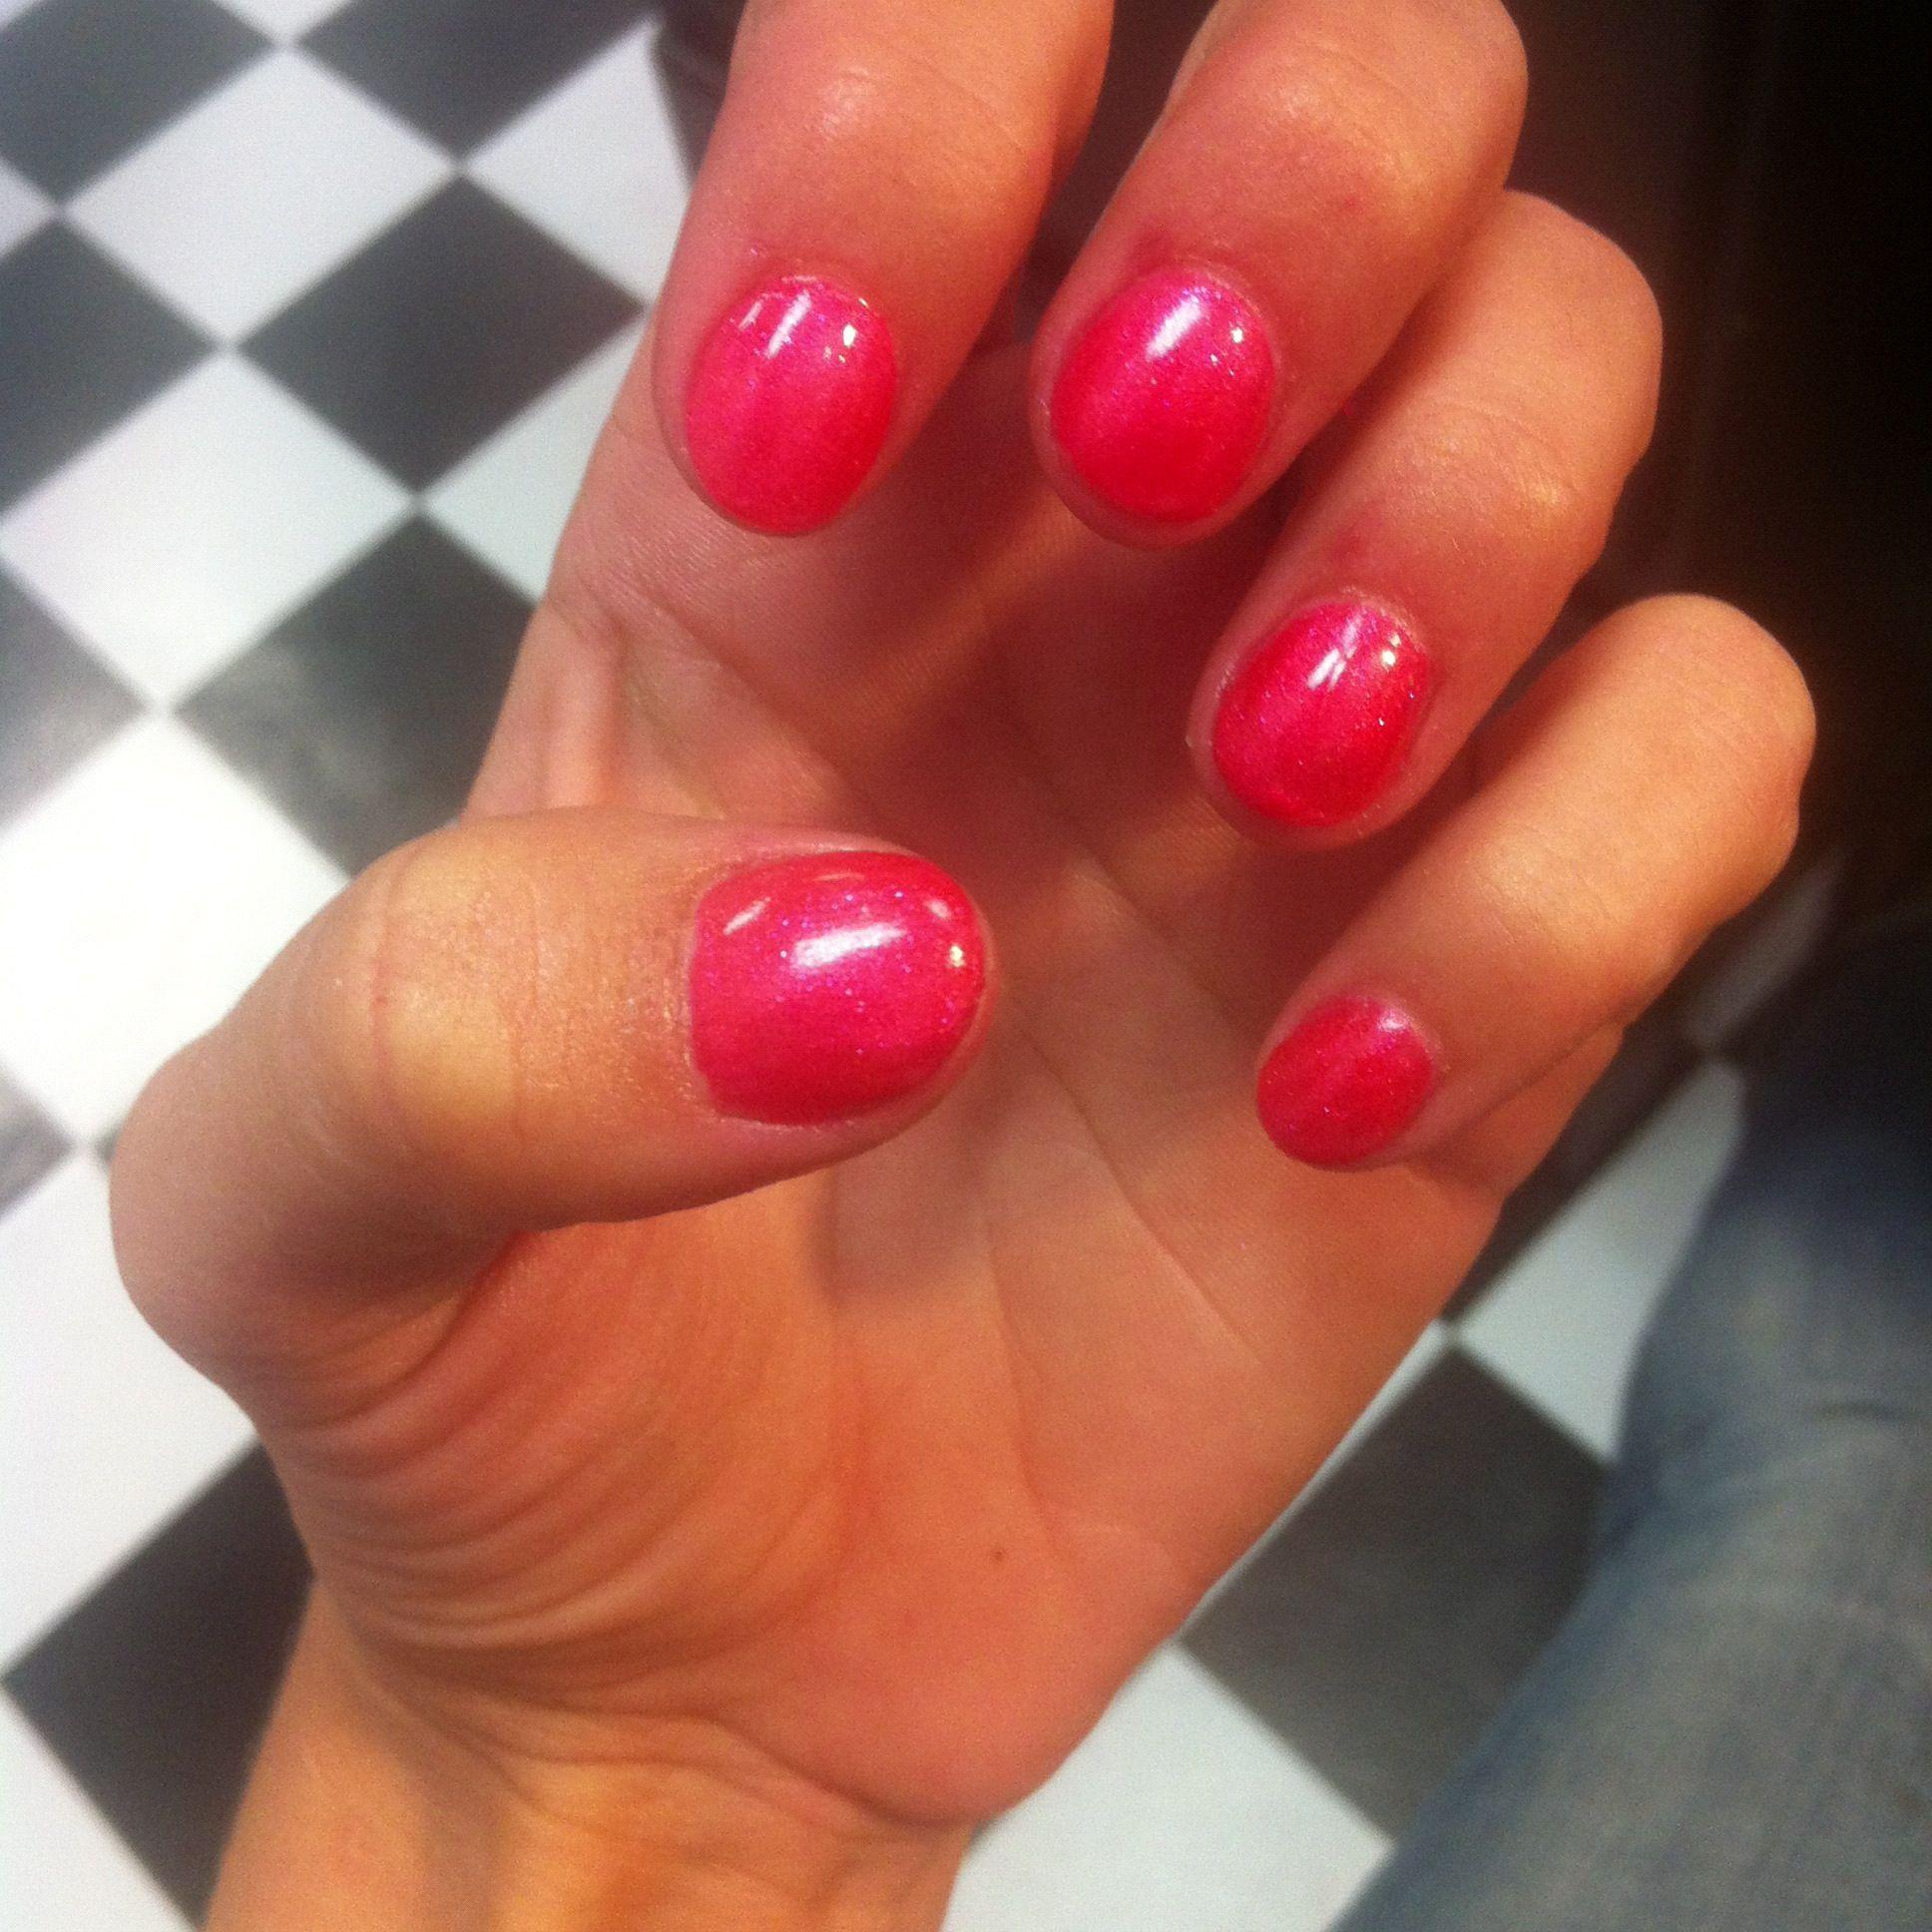 can acrylic nails last 3 weeks photo - 2